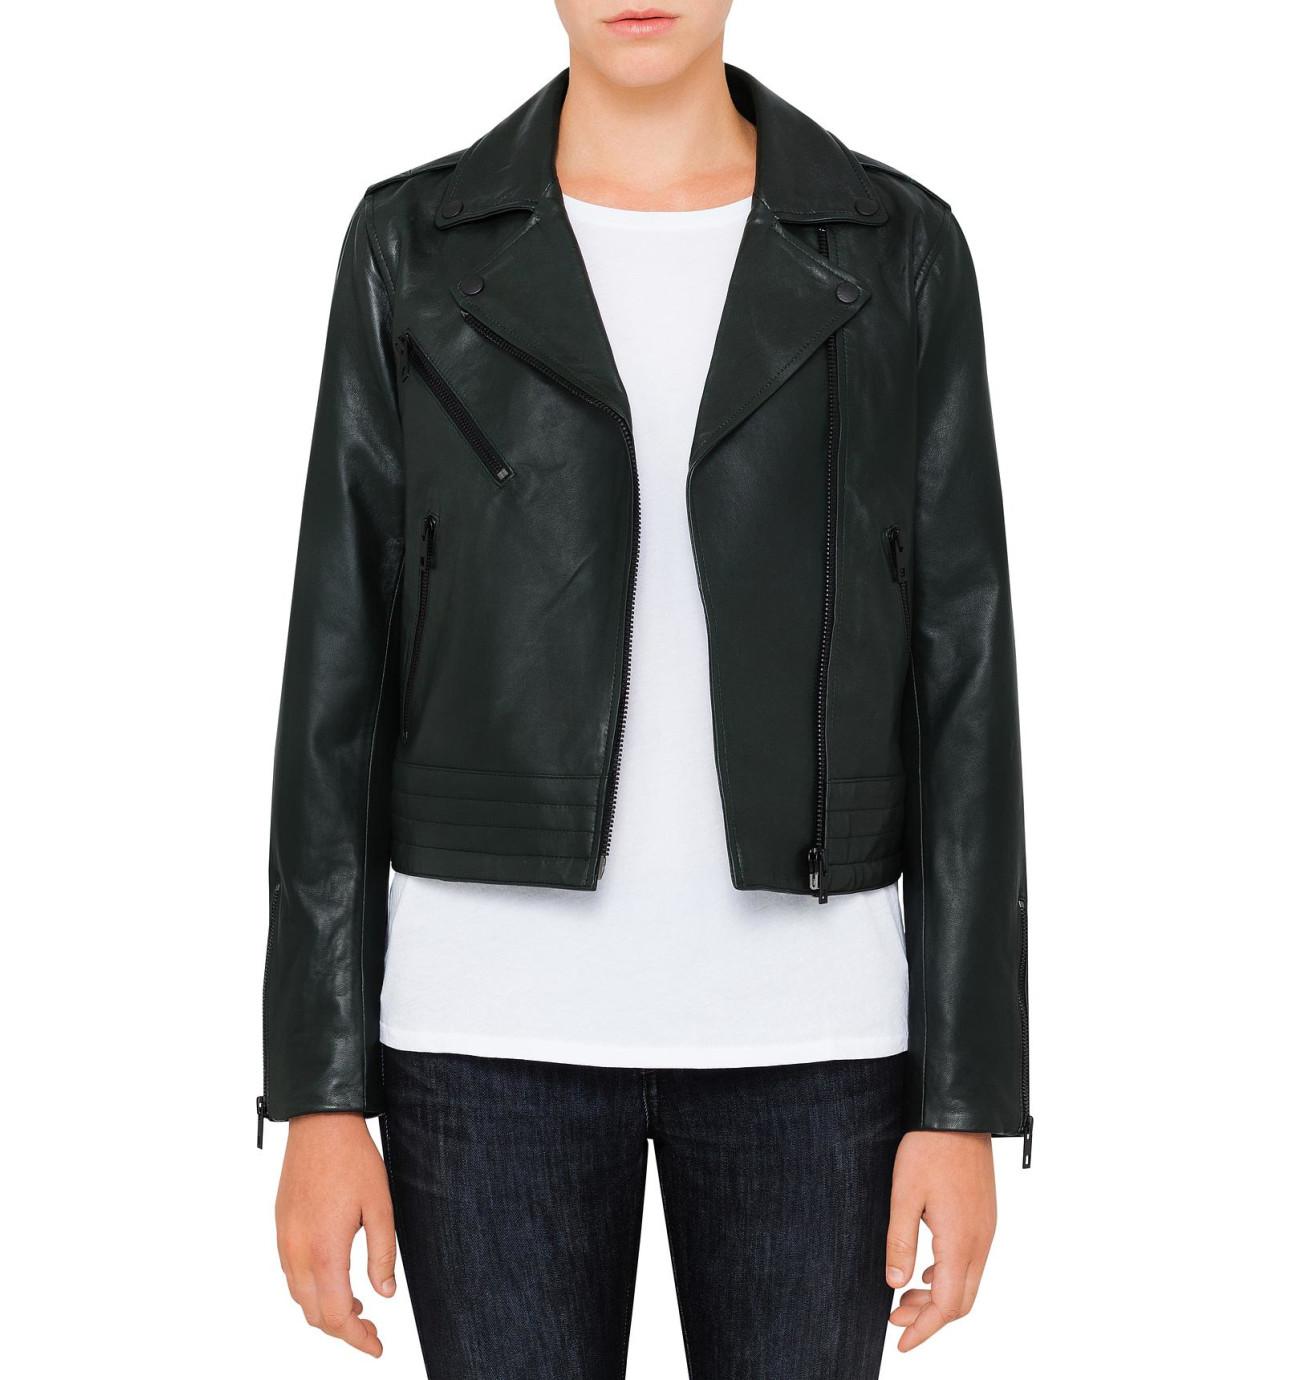 Mens jacket david jones - Mercer Leather Jacket